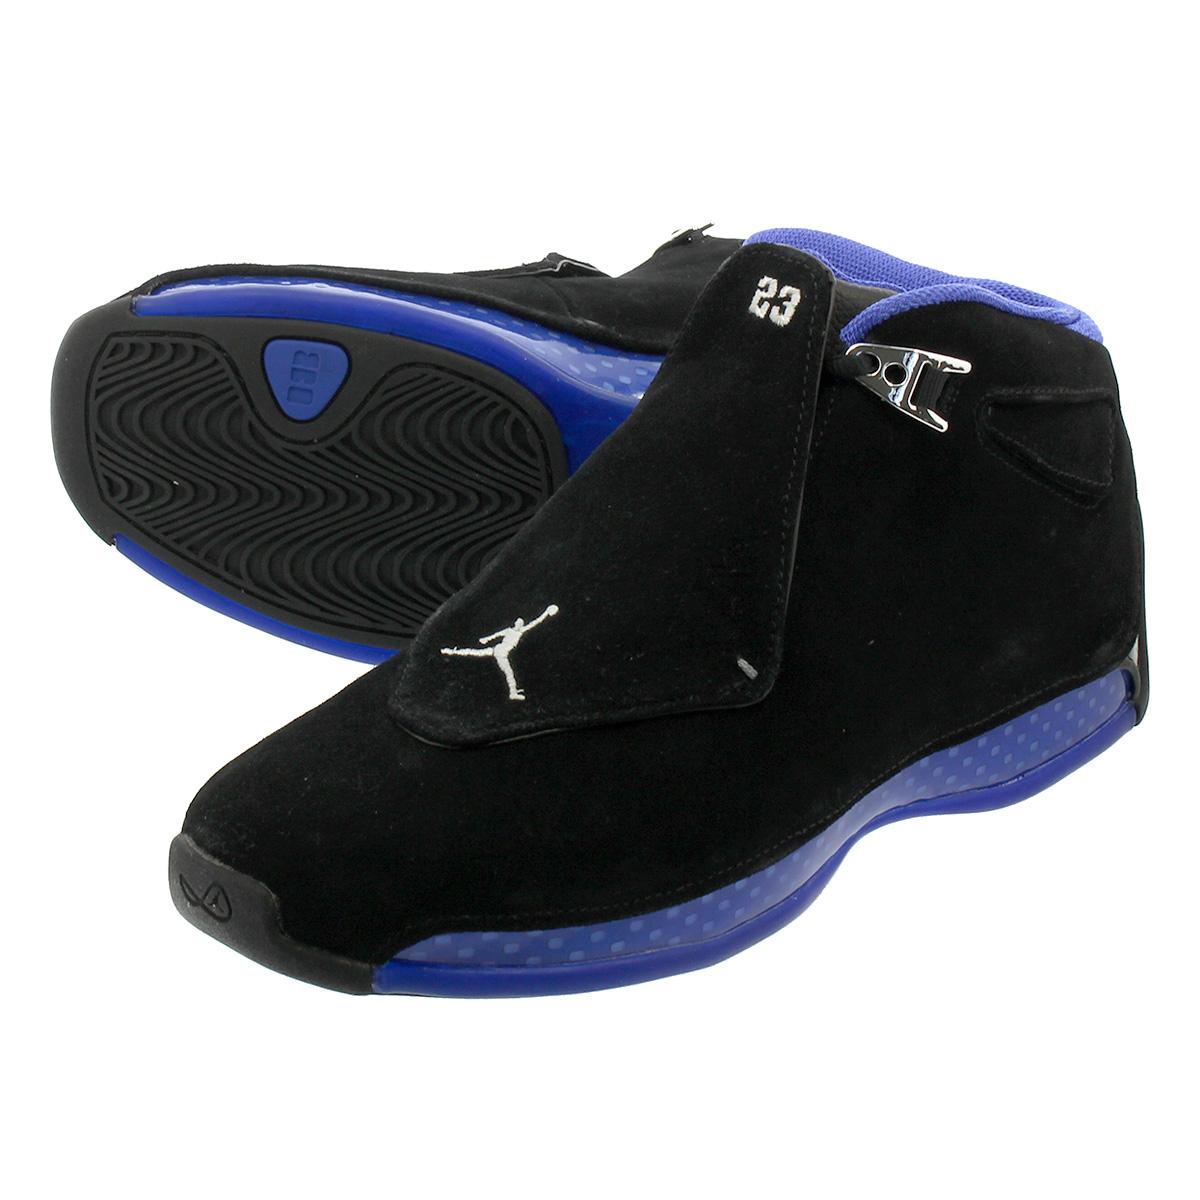 c98c7ccbede52a NIKE AIR JORDAN 18 RETRO Nike Air Jordan 18 nostalgic BLACK METALLIC  SILVER SPORT ROYAL aa2494-007